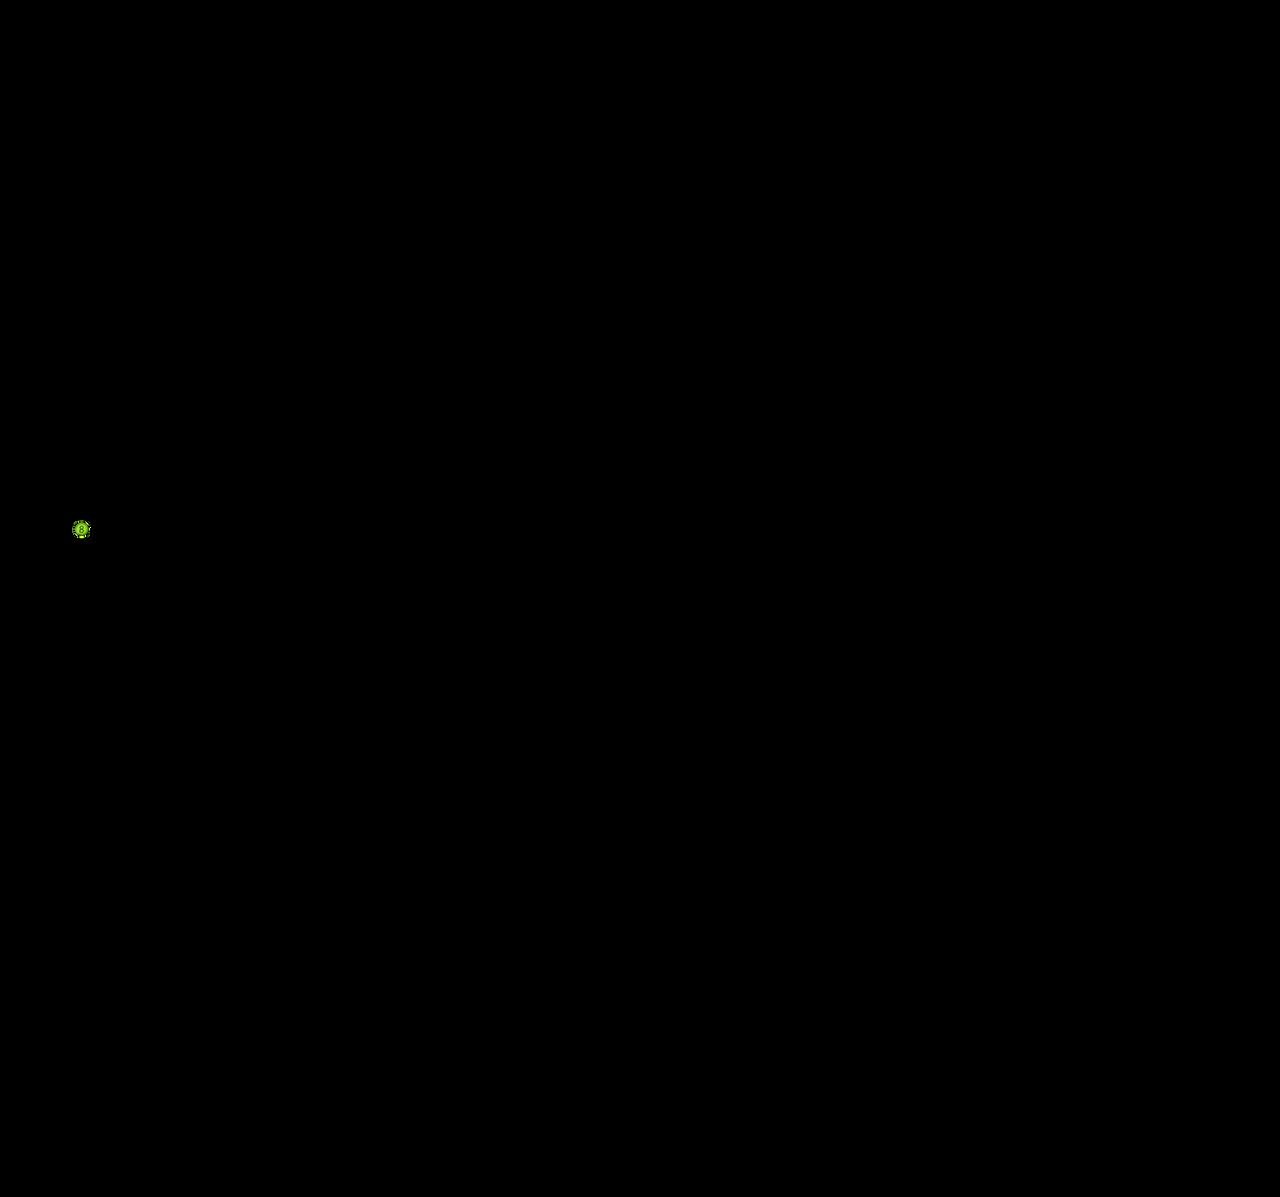 2003 Toyota Matrix Alternator Wiring Diagram on Regulator 2003 Ford Expedition Fuse Box